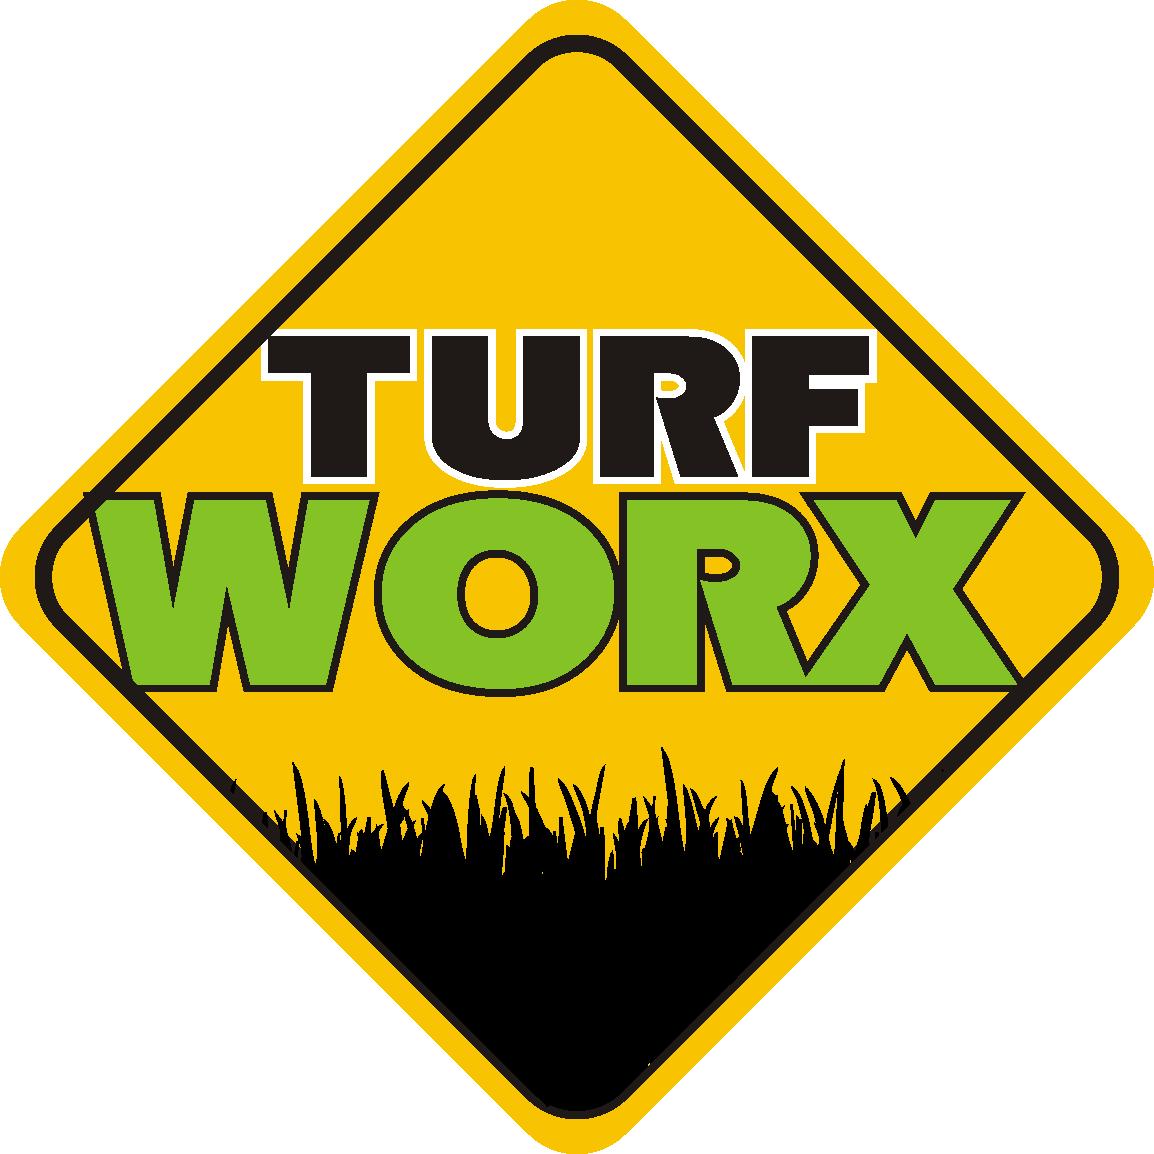 Turf Worx - Sunmark Seeds - Portland, OR